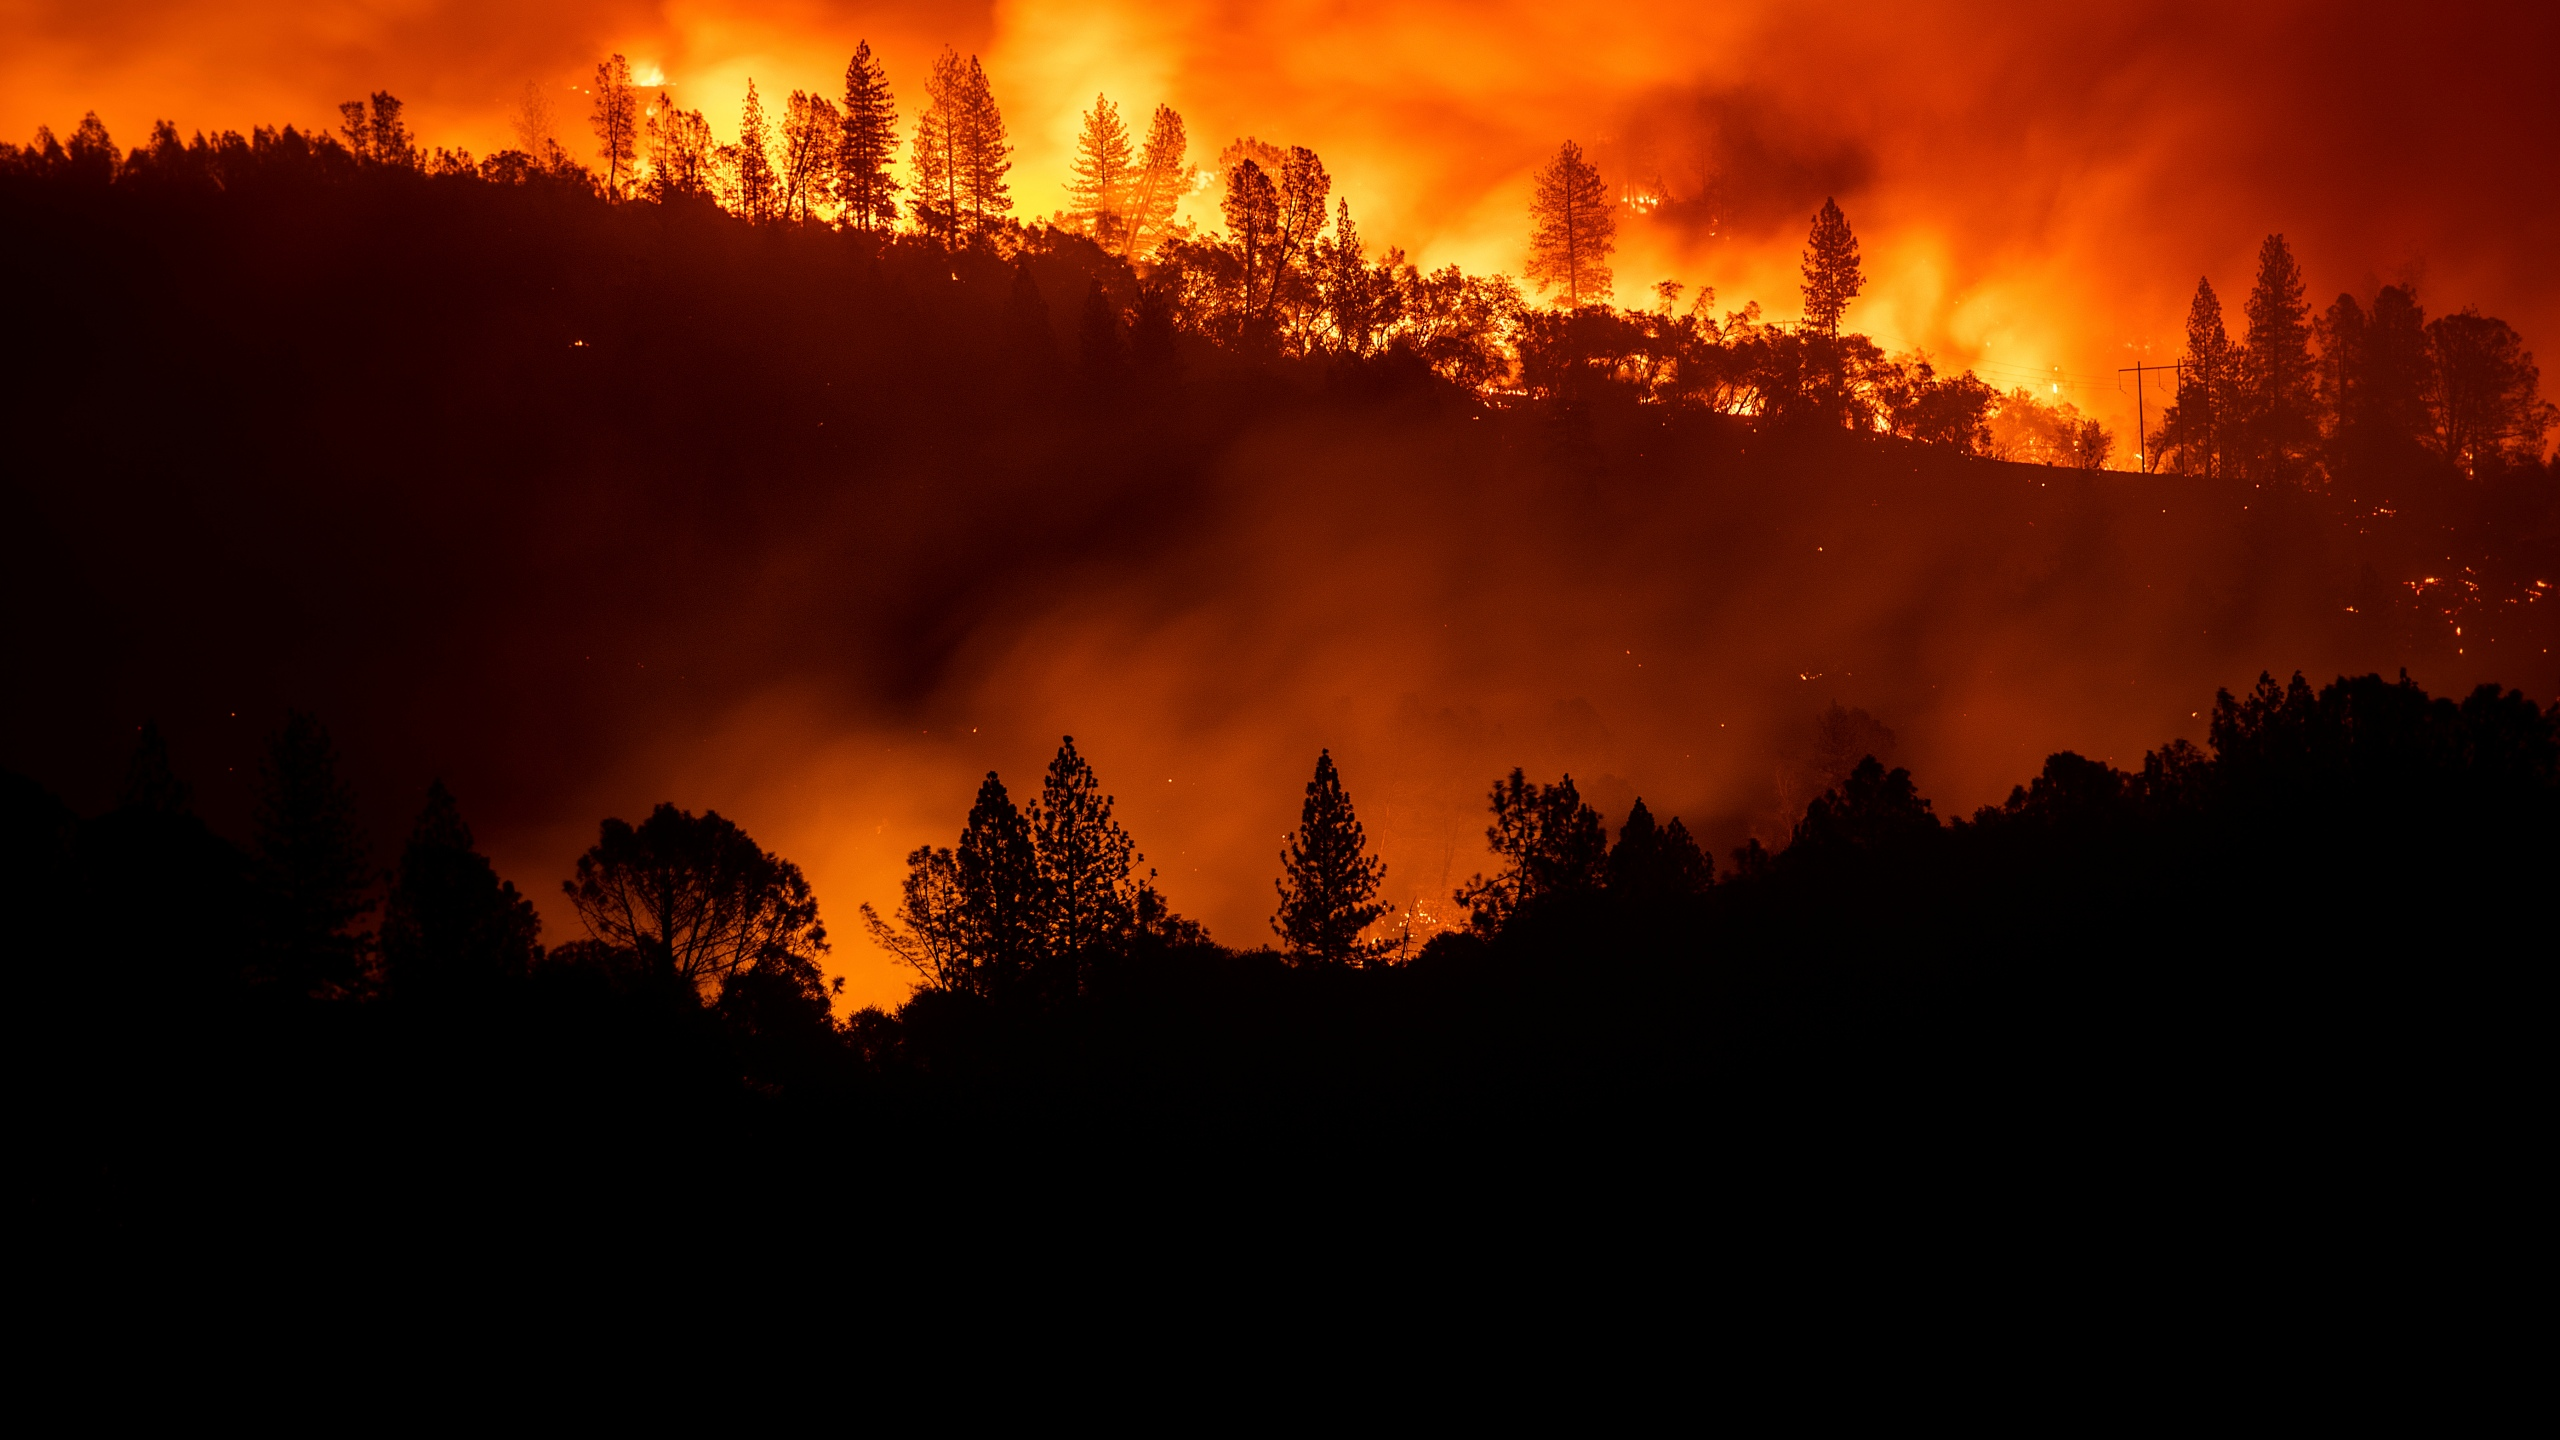 California_Wildfires_33886-159532.jpg41271910